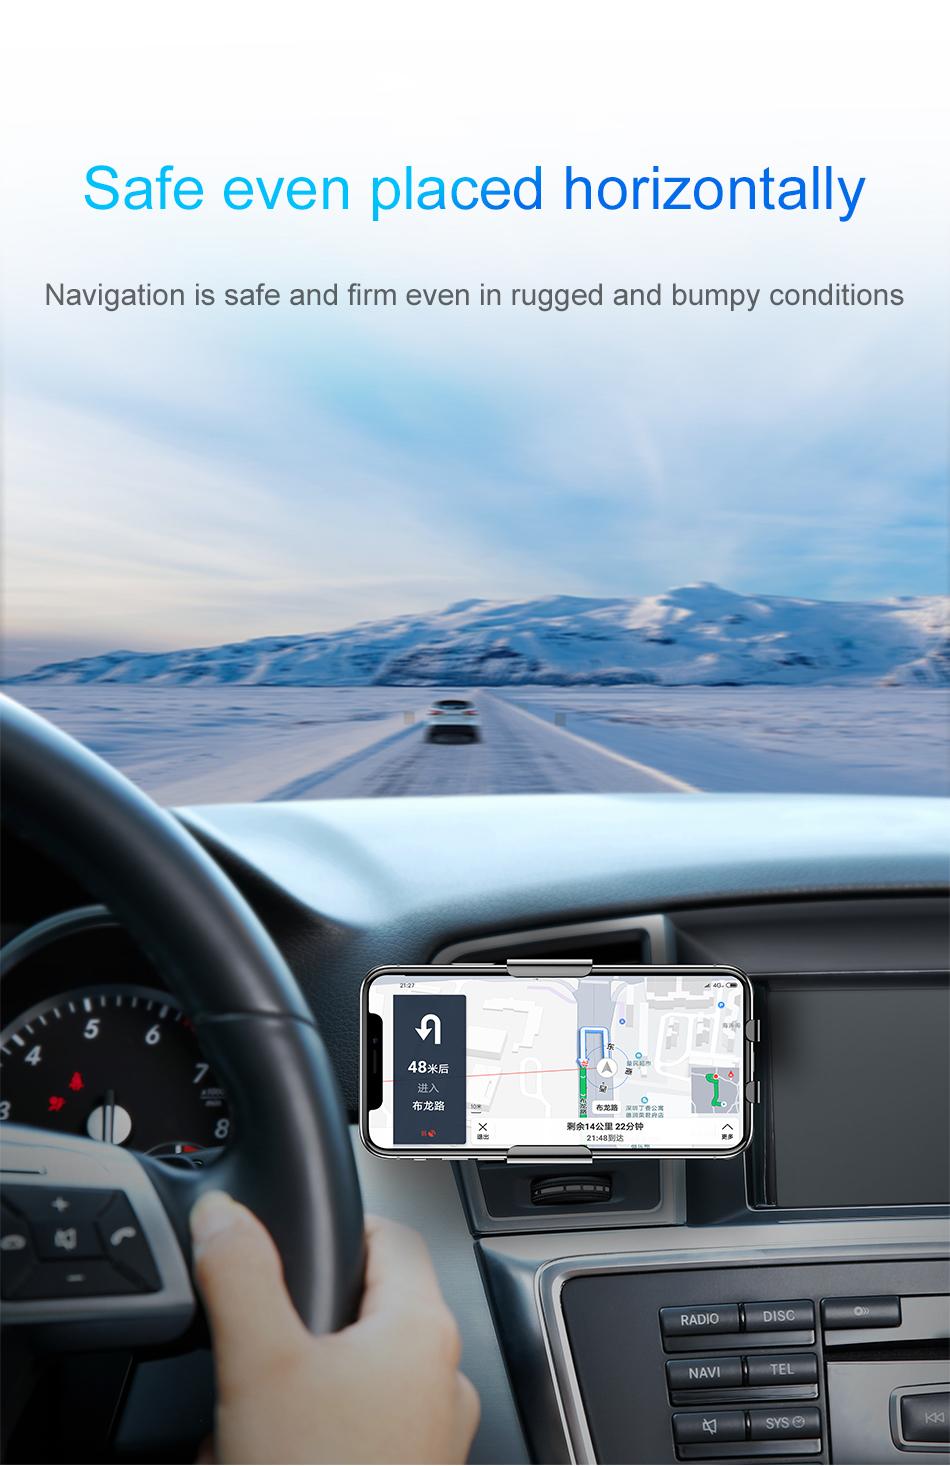 HTB1ZjSBXiHrK1Rjy0Flq6AsaFXa7 - Baseus Qi Car Wireless Charger For iPhone Xs Max XR X Samsung Intelligent Infrared Sensor Fast Wirless Charging Car Phone Holder